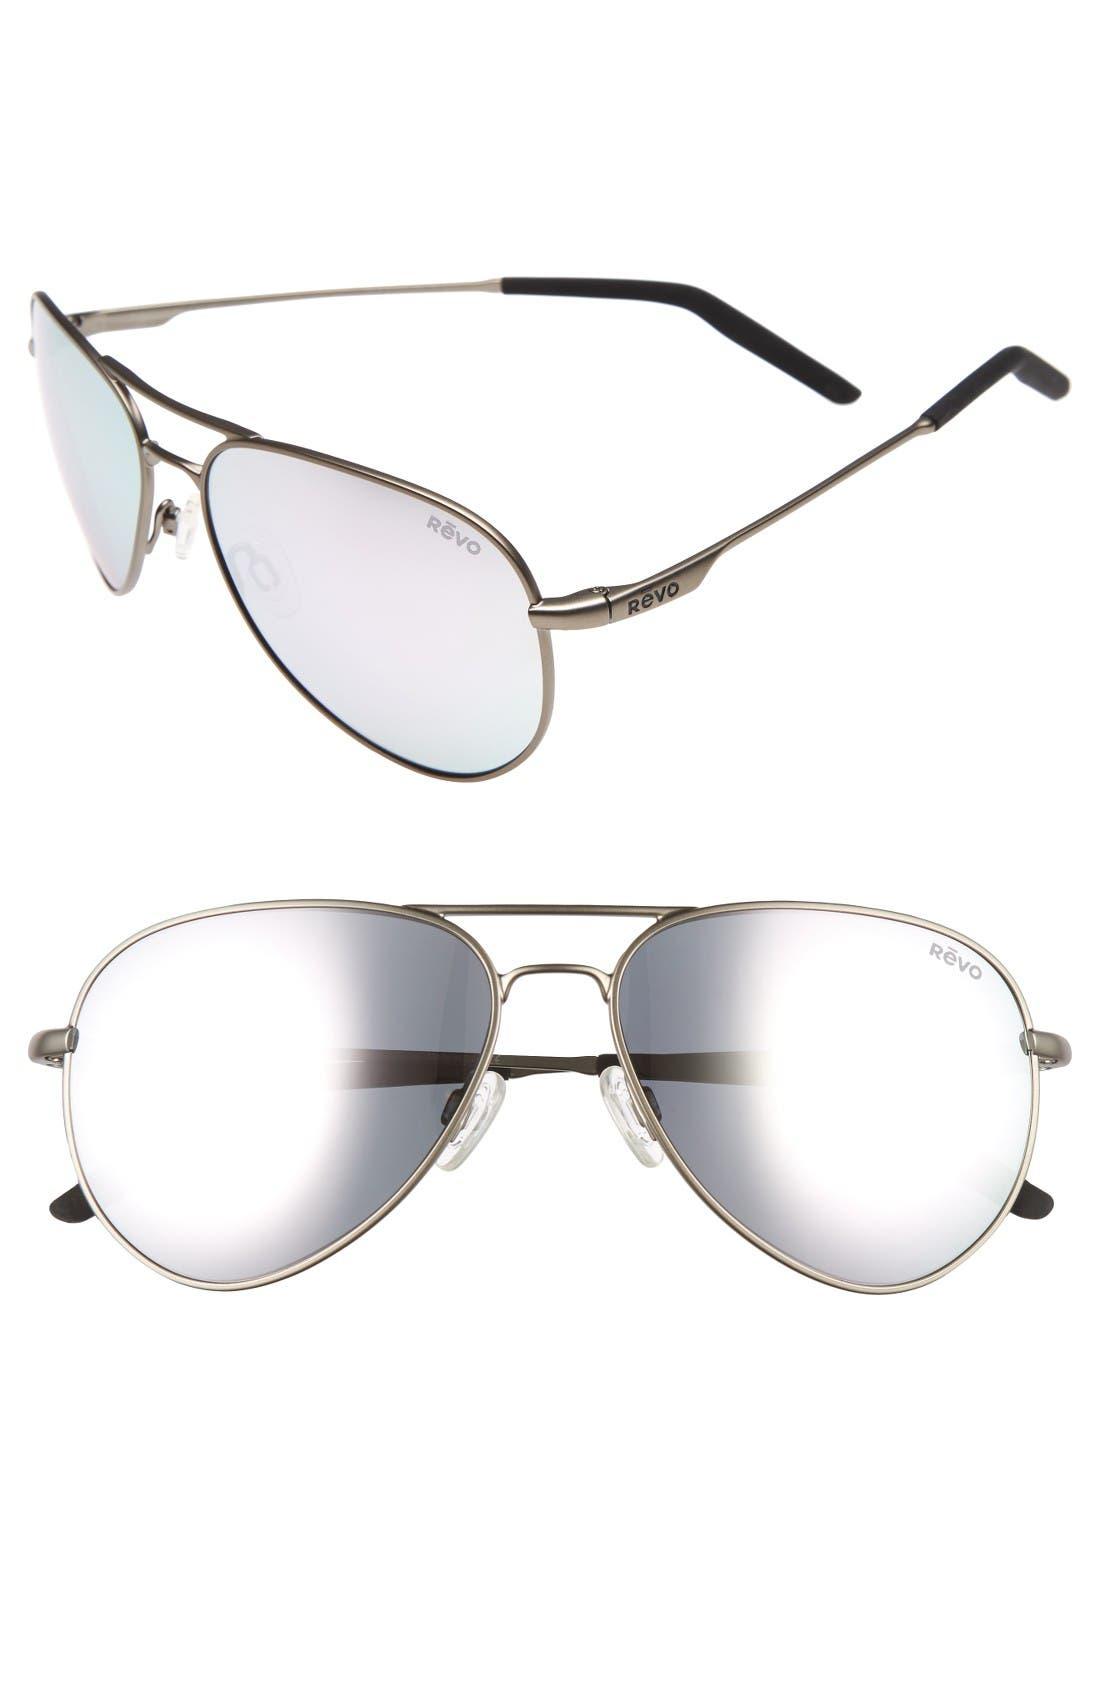 Revo Observer 58mm Sunglasses